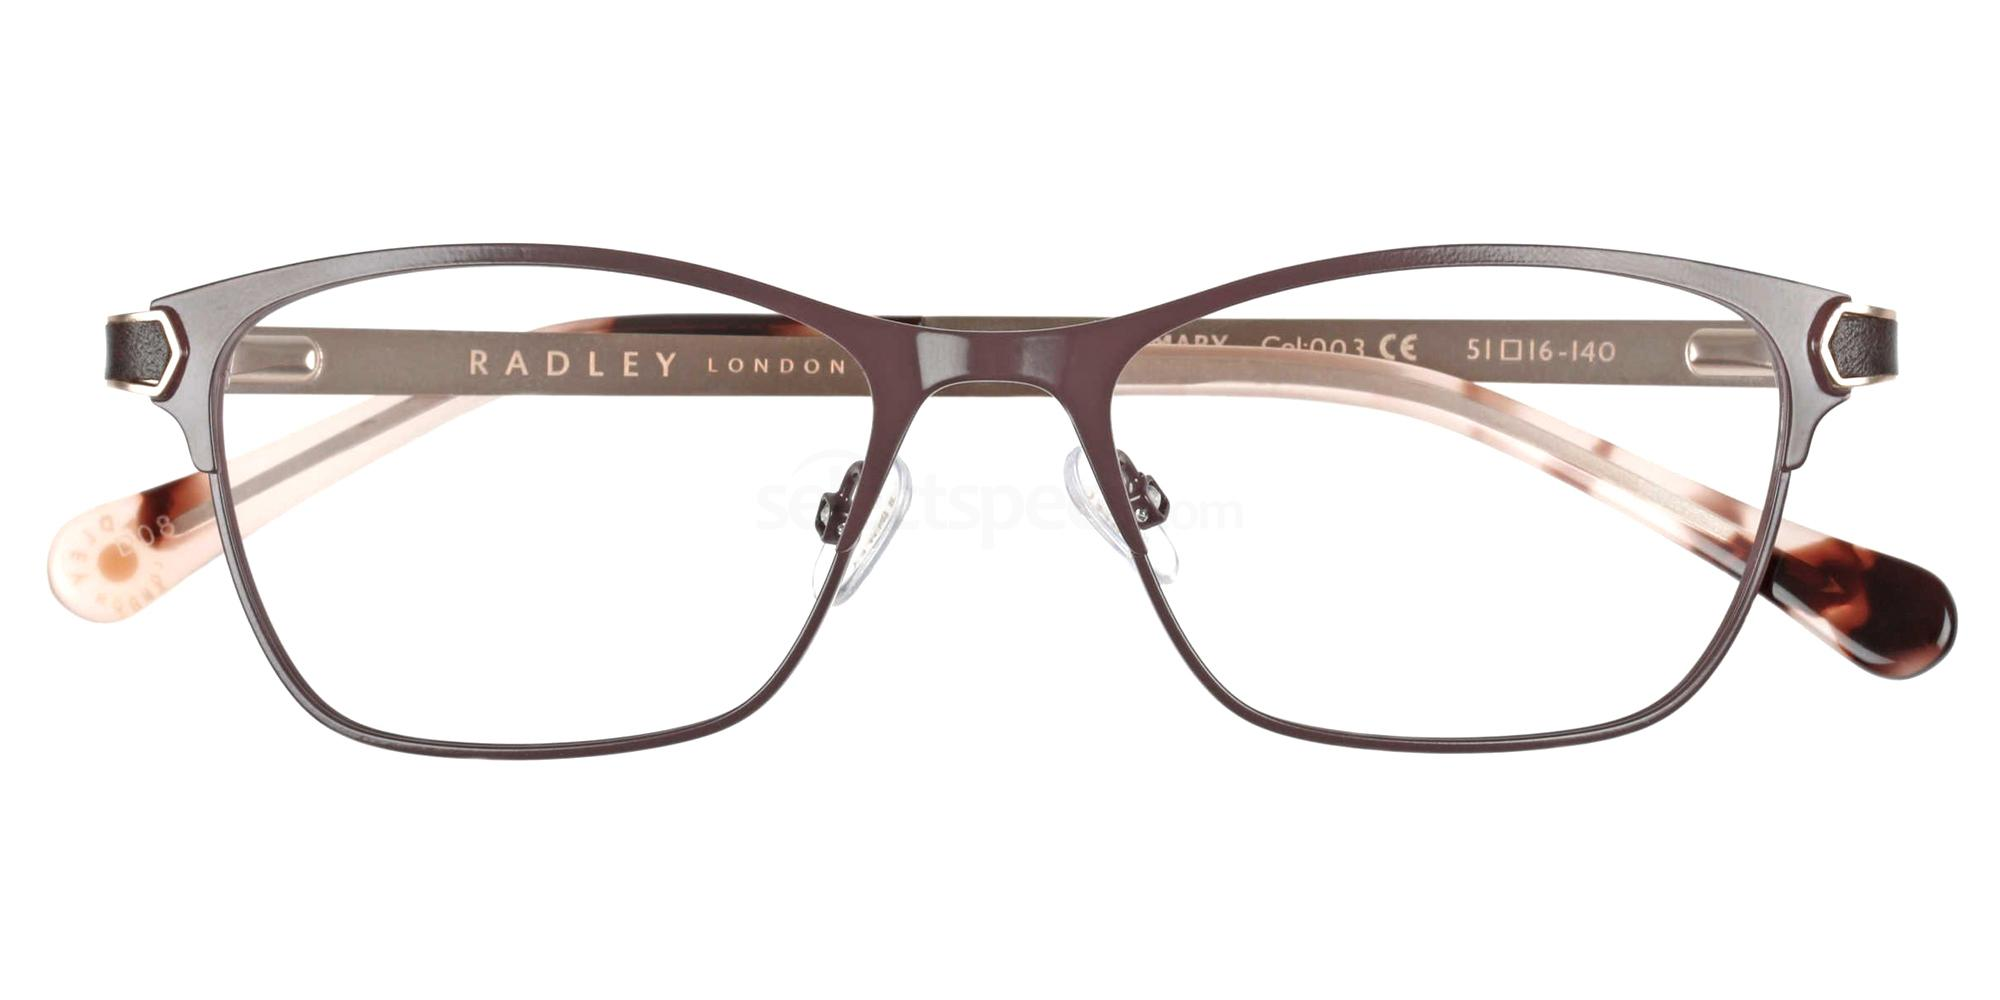 003 RDO-ROSEMARY Glasses, Radley London